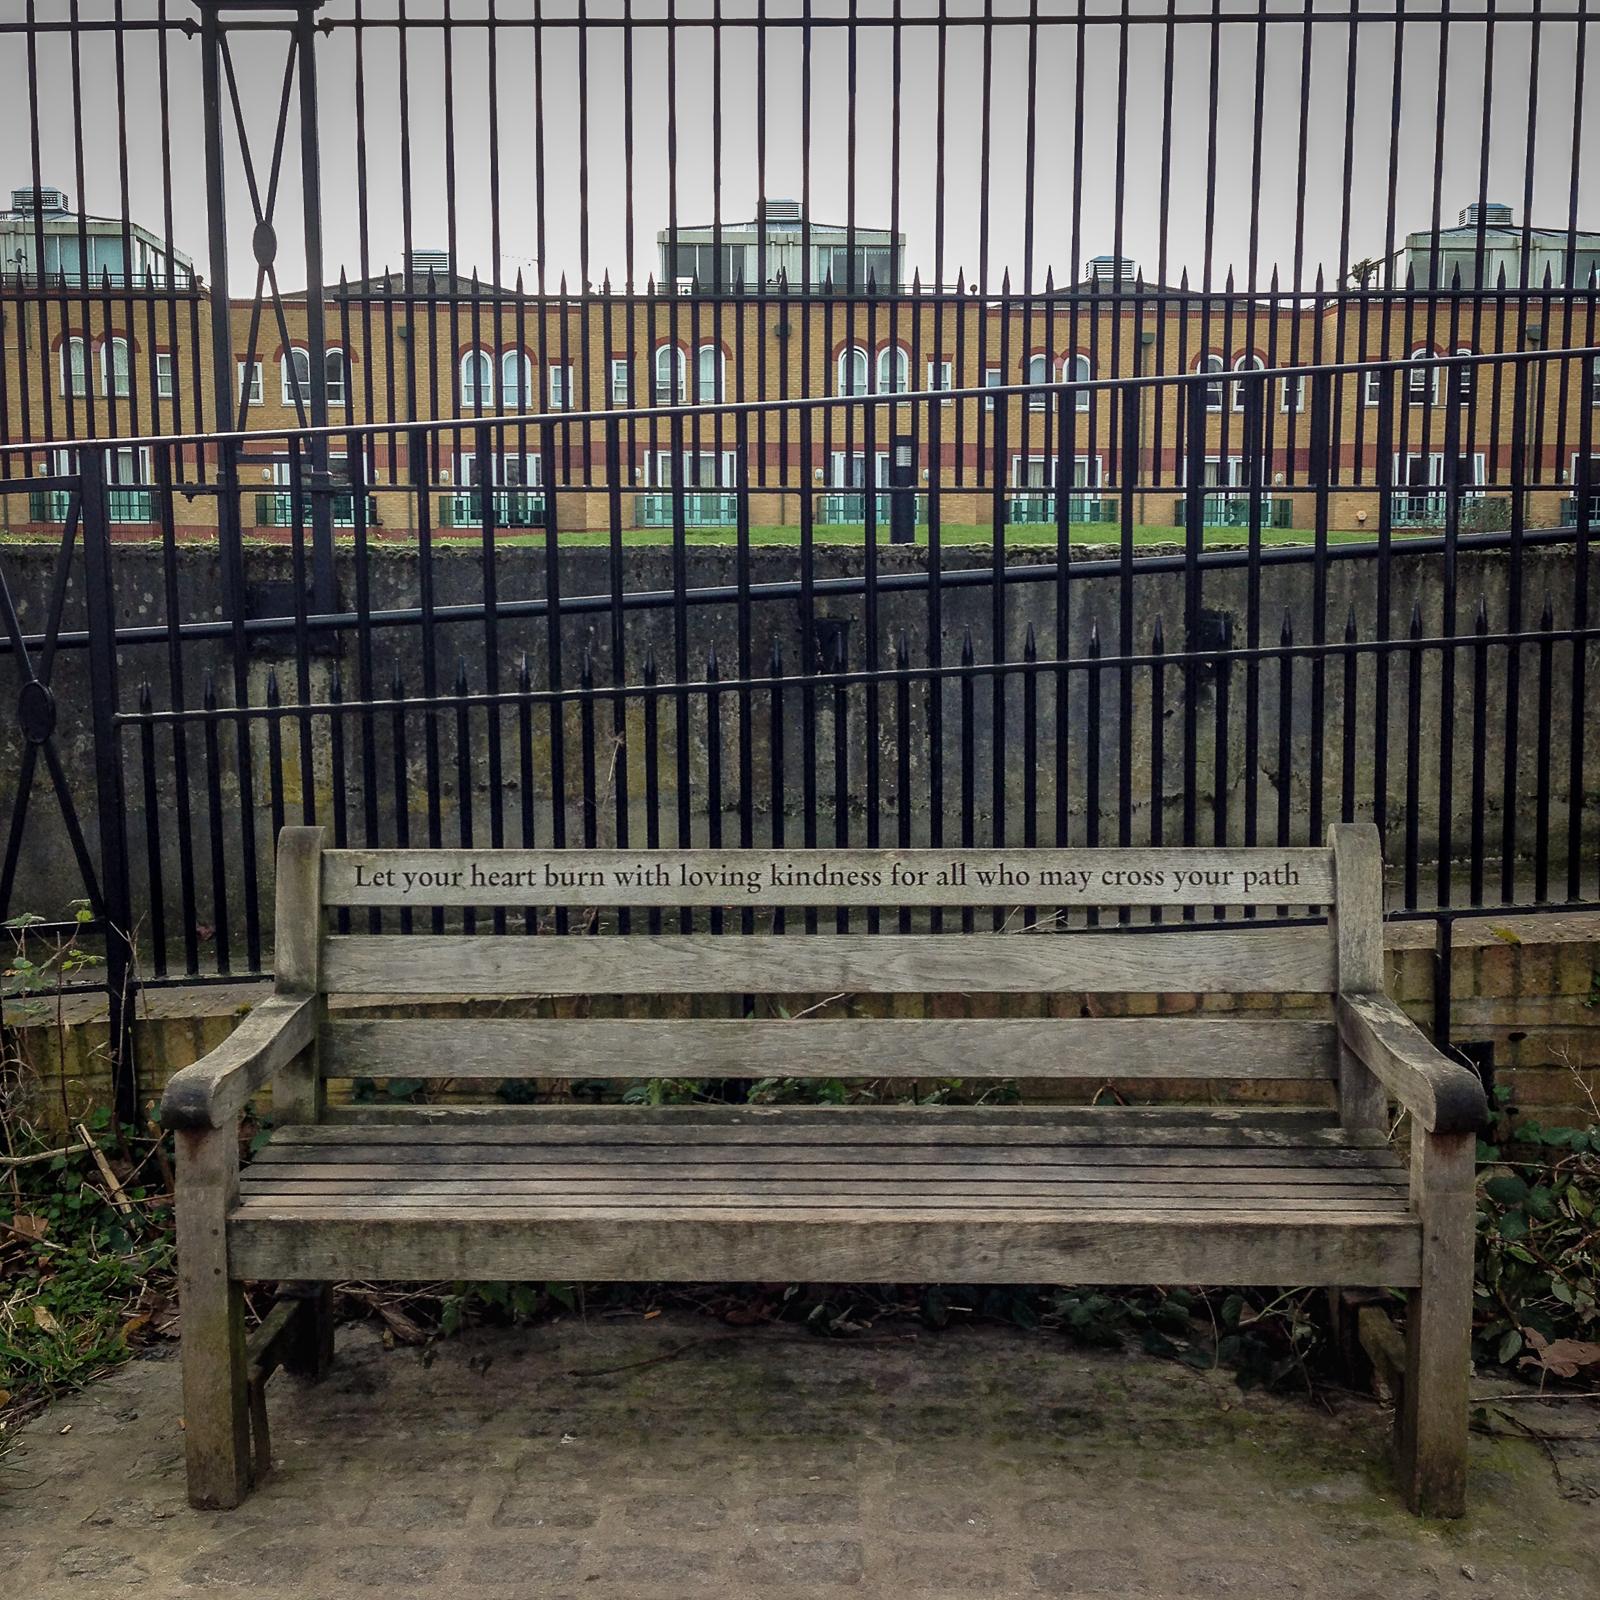 20170223_Richmond-Upon-Thames_Metropolitan-Open-Land_Let-Your-Heart-Burn